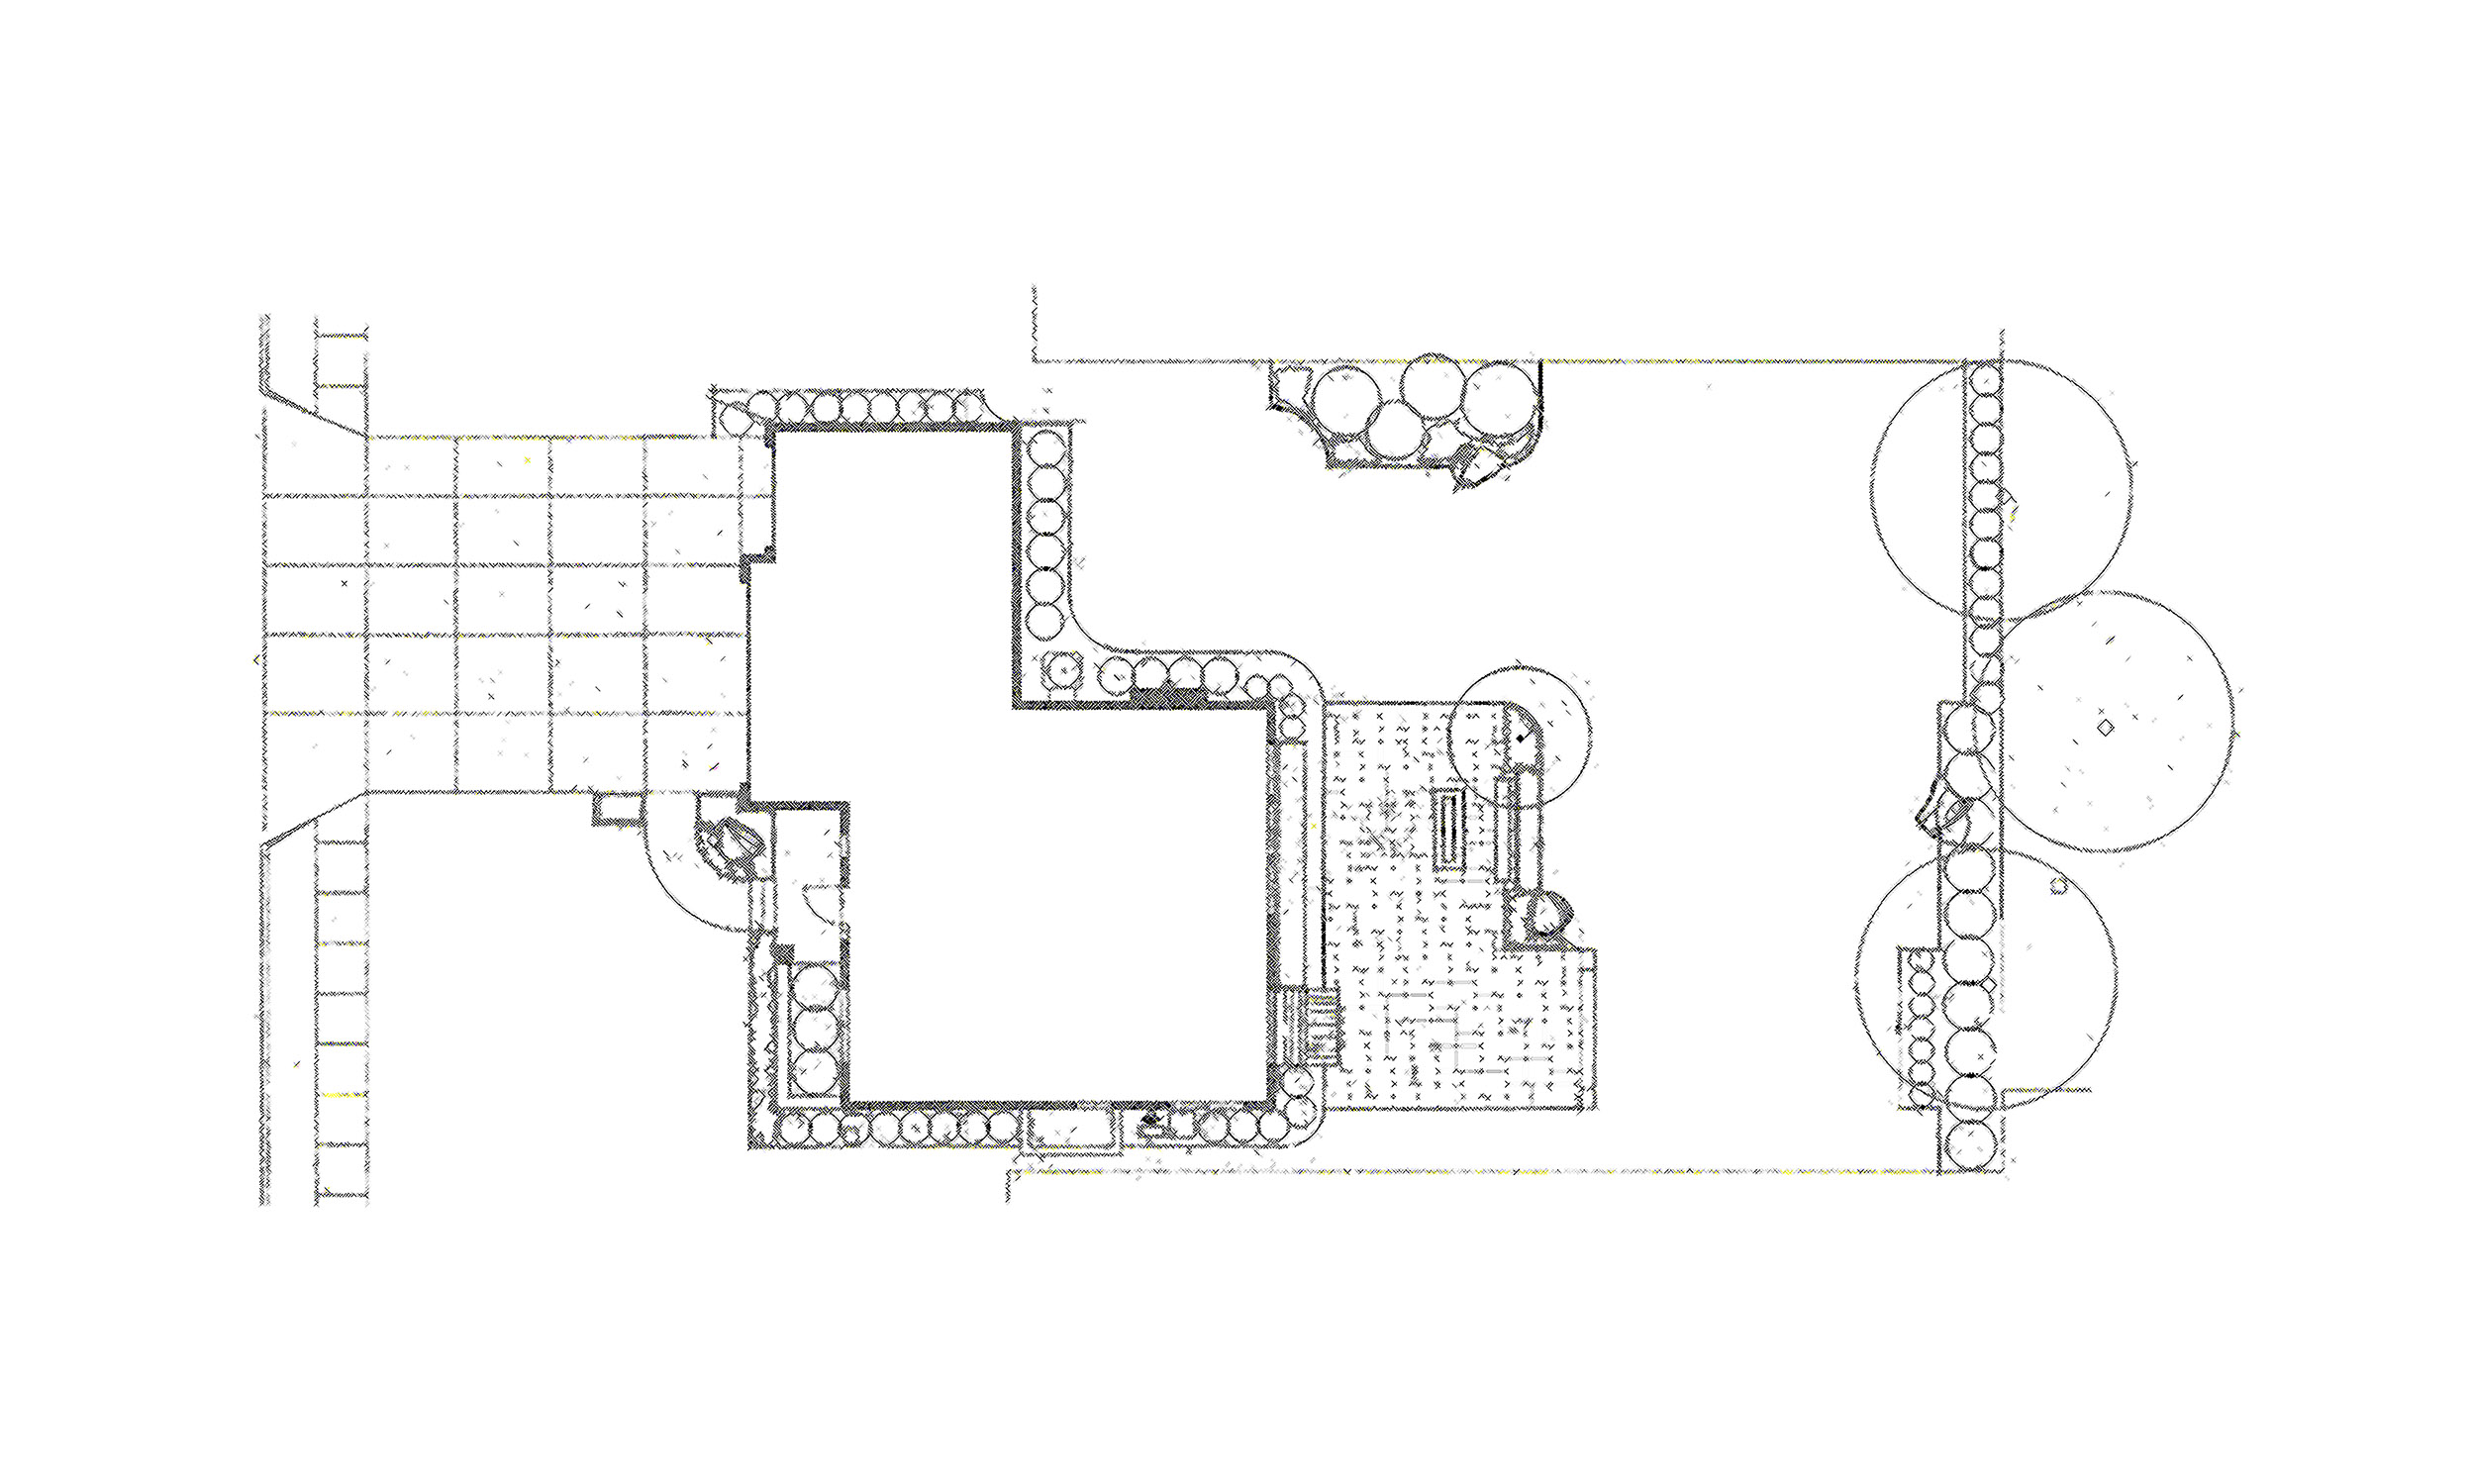 chilvers - plan sketch.jpg